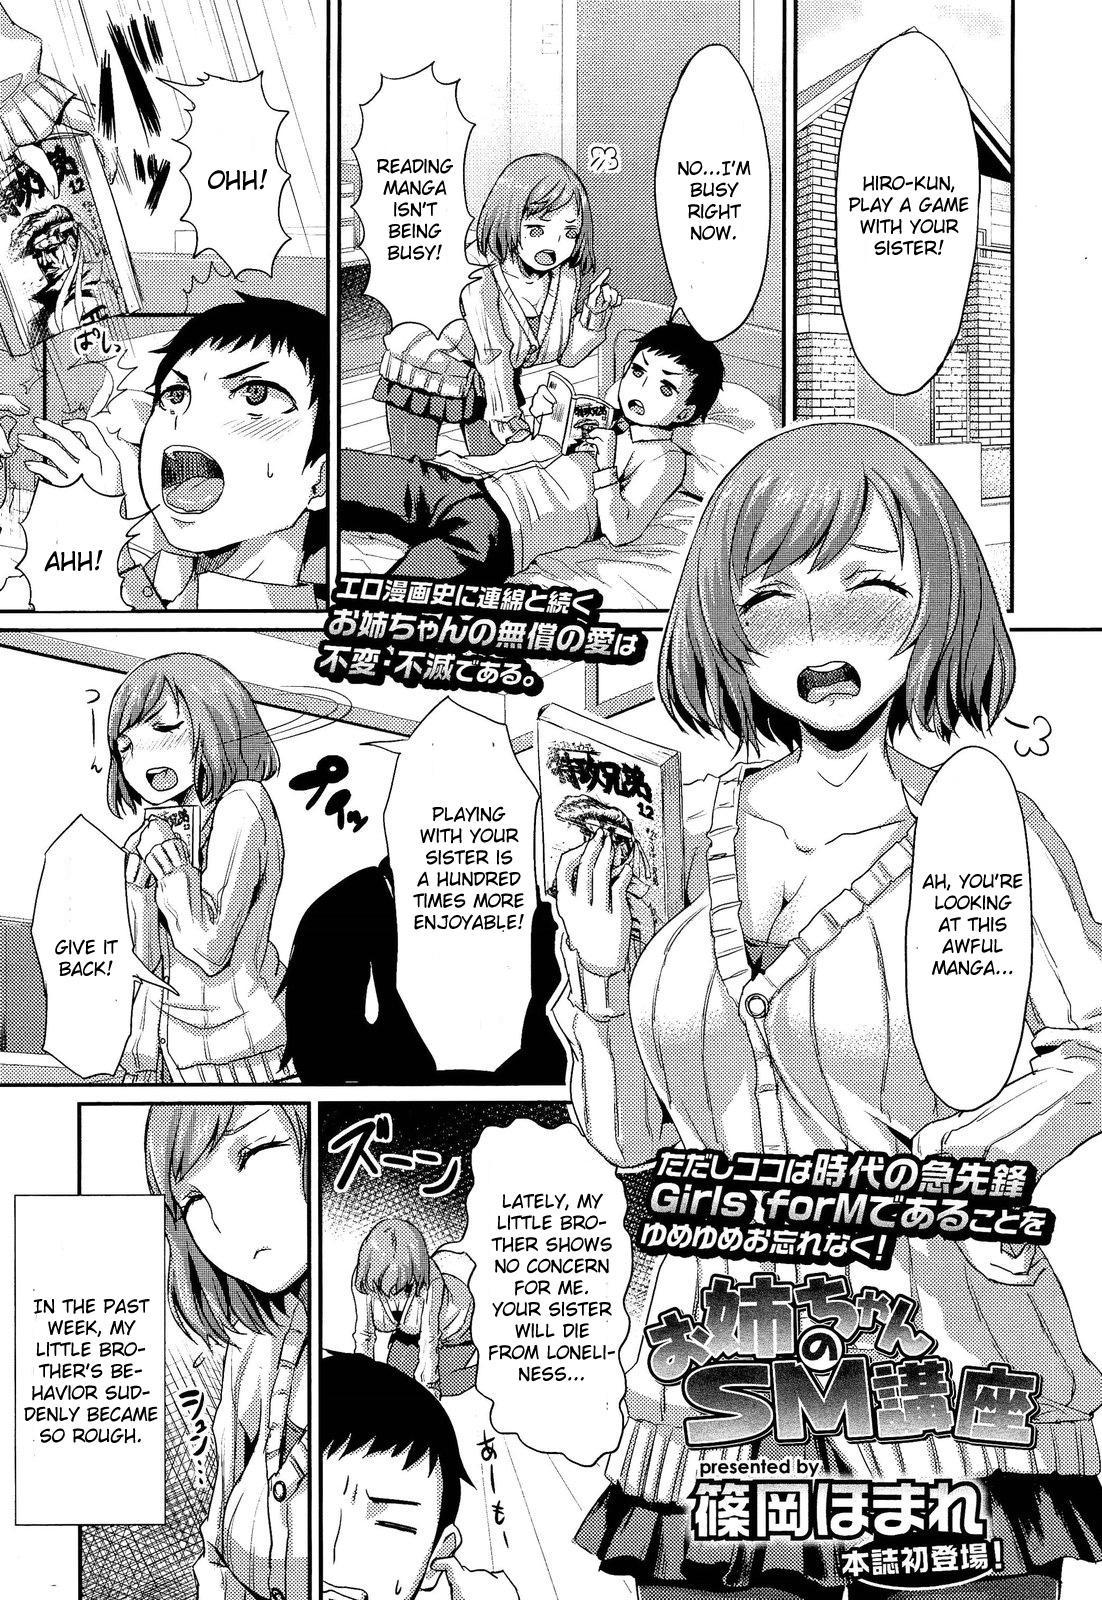 [Shinooka Homare] Onee-chan no SM Kouza | Onee-chan's S&M Lecture (Girls forM Vol. 02) [English] [CGrascal] 0